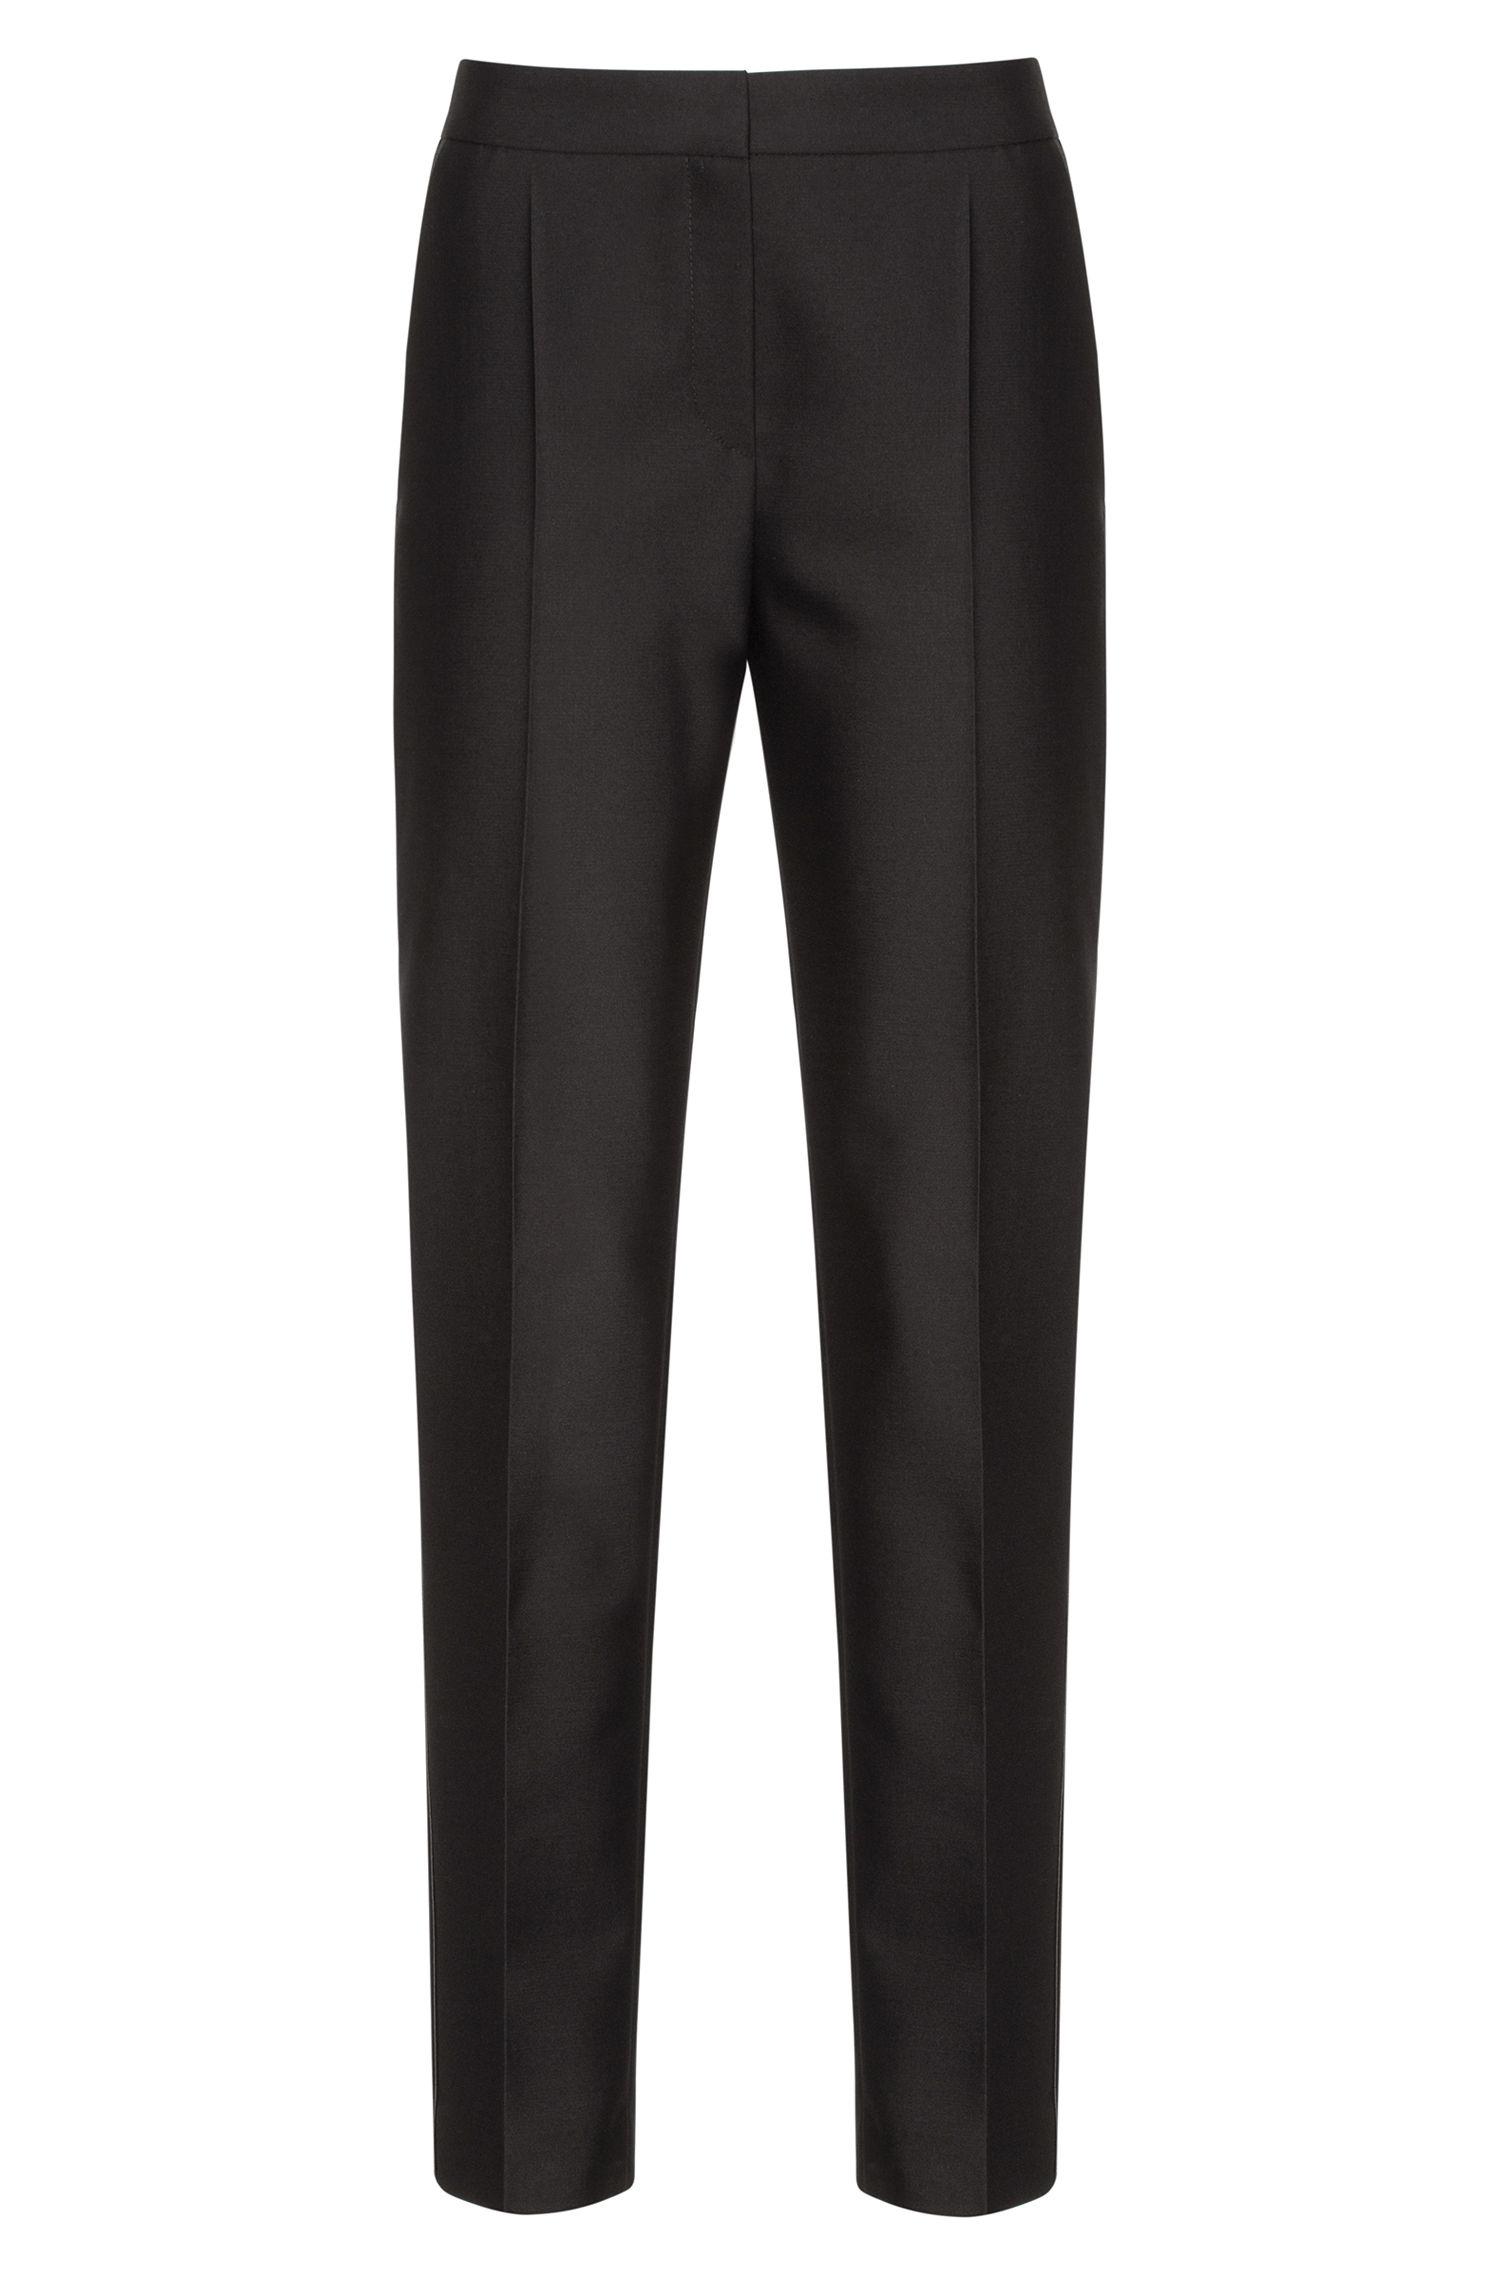 Wool-Cotton Cropped Tuxedo Pant | Hokelly